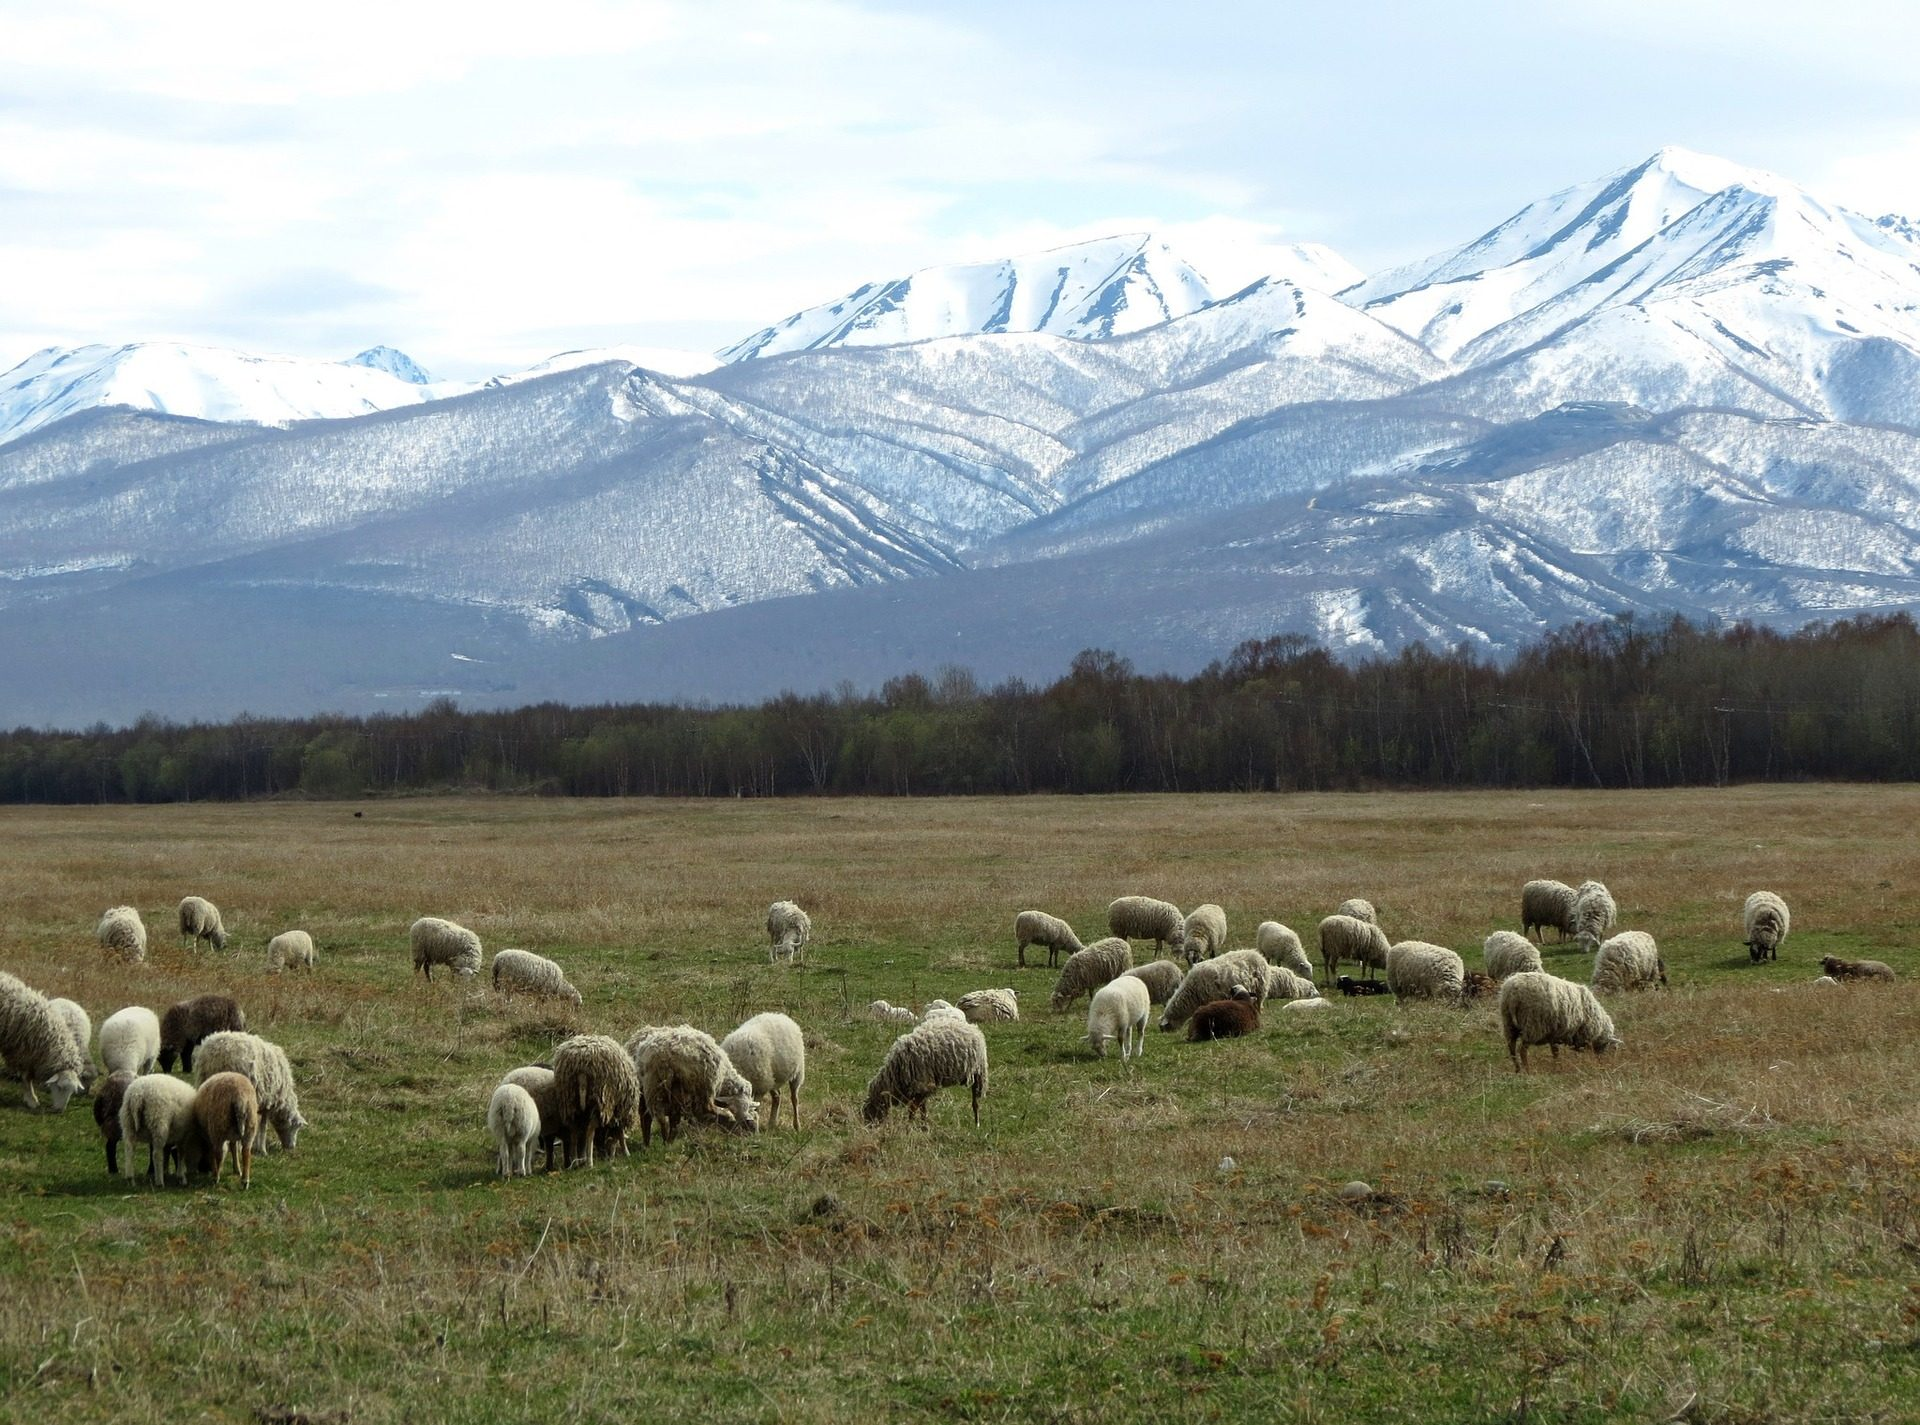 Troupeau, moutons, pâturage, Montañas, chute de neige - Fonds d'écran HD - Professor-falken.com